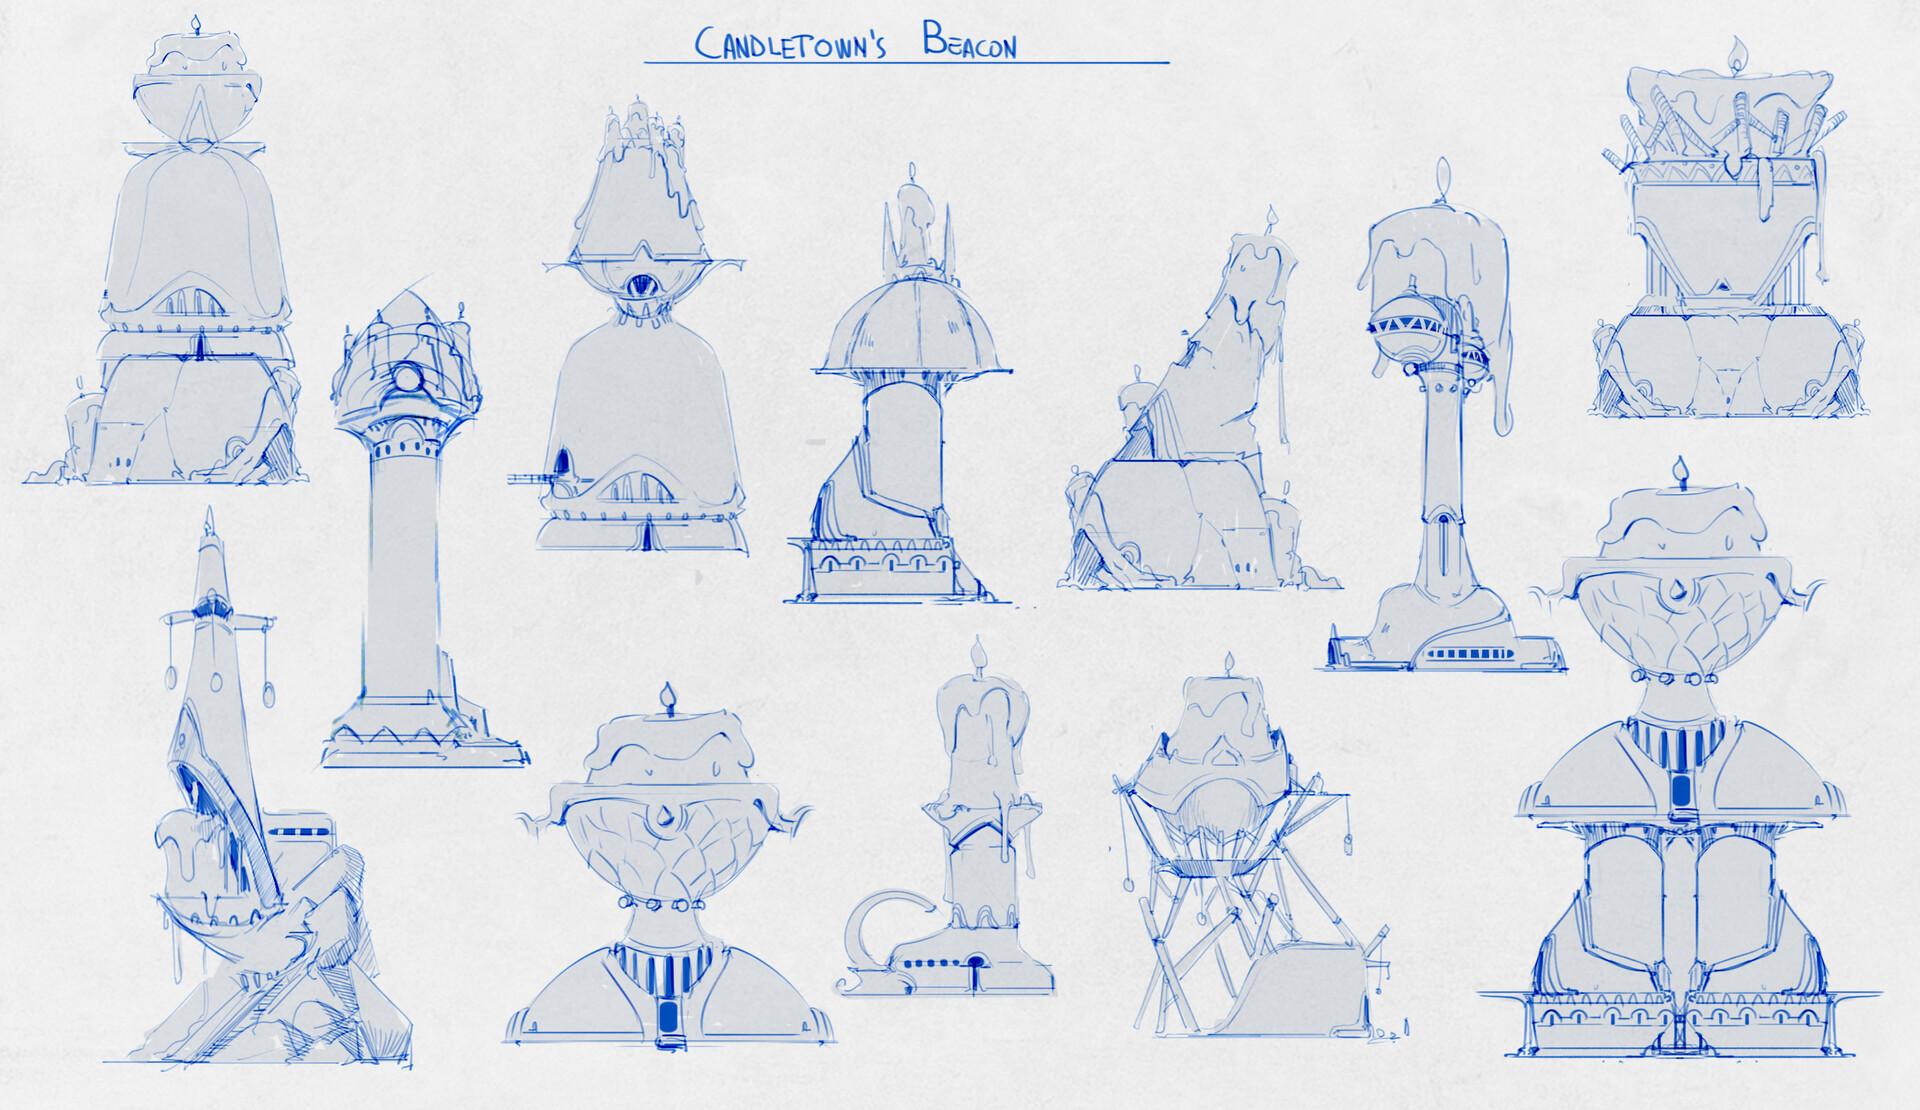 Beacon exploration sketches